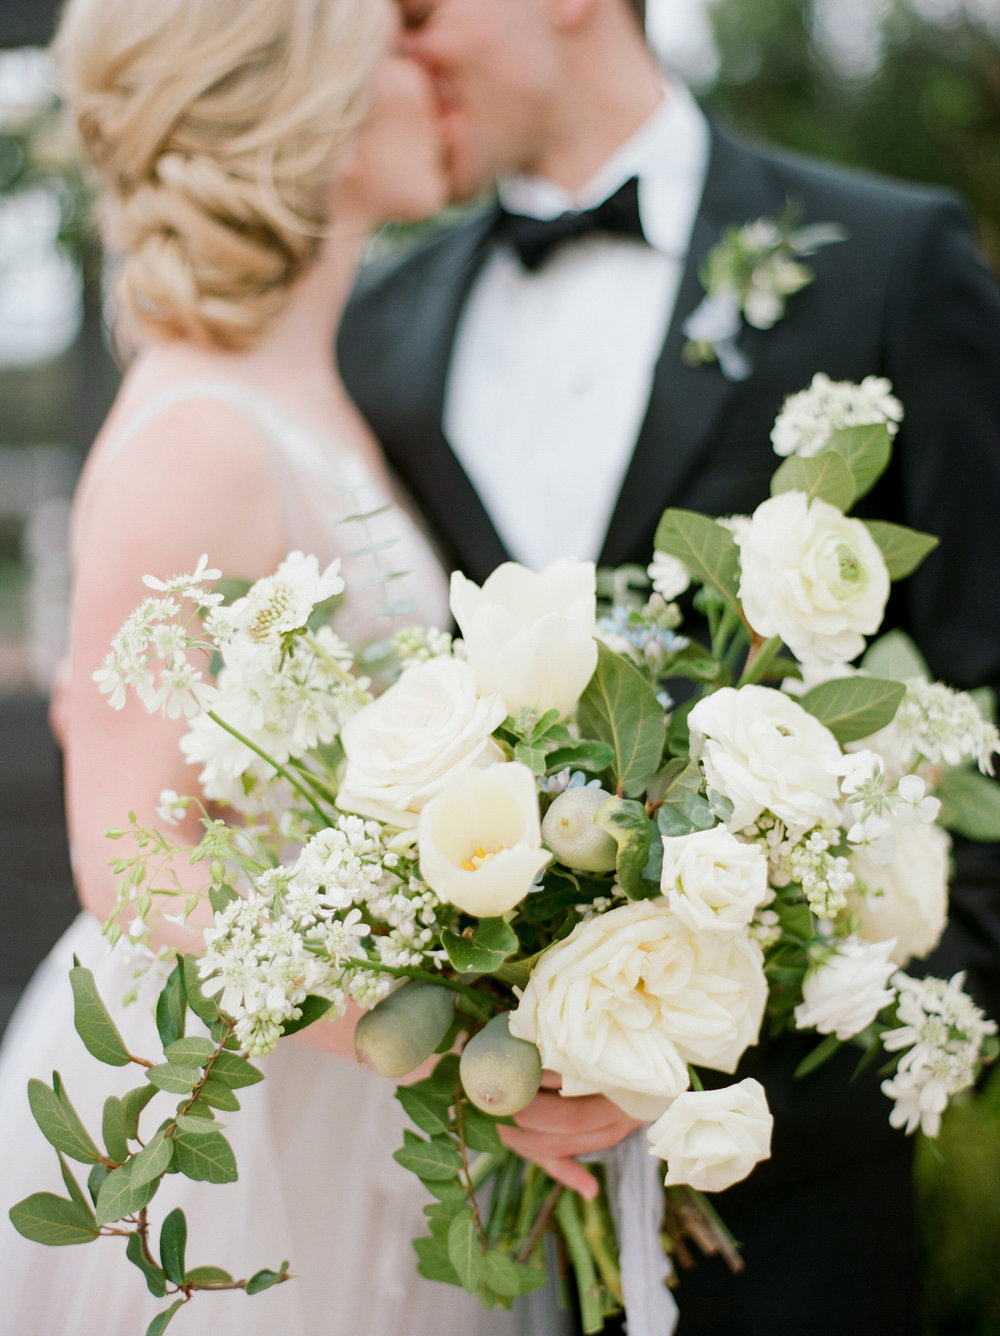 McGovern-Centennial-Gardens-Houston-Texas-Wedding-Venue-Josh-Dana-Fernandez-Photography-Film-Destination-Fine-Art-Luxury-Top-Best-Austin-Dallas-Magnolia-Rouge-Jennifer-Laura-Design-7.jpg